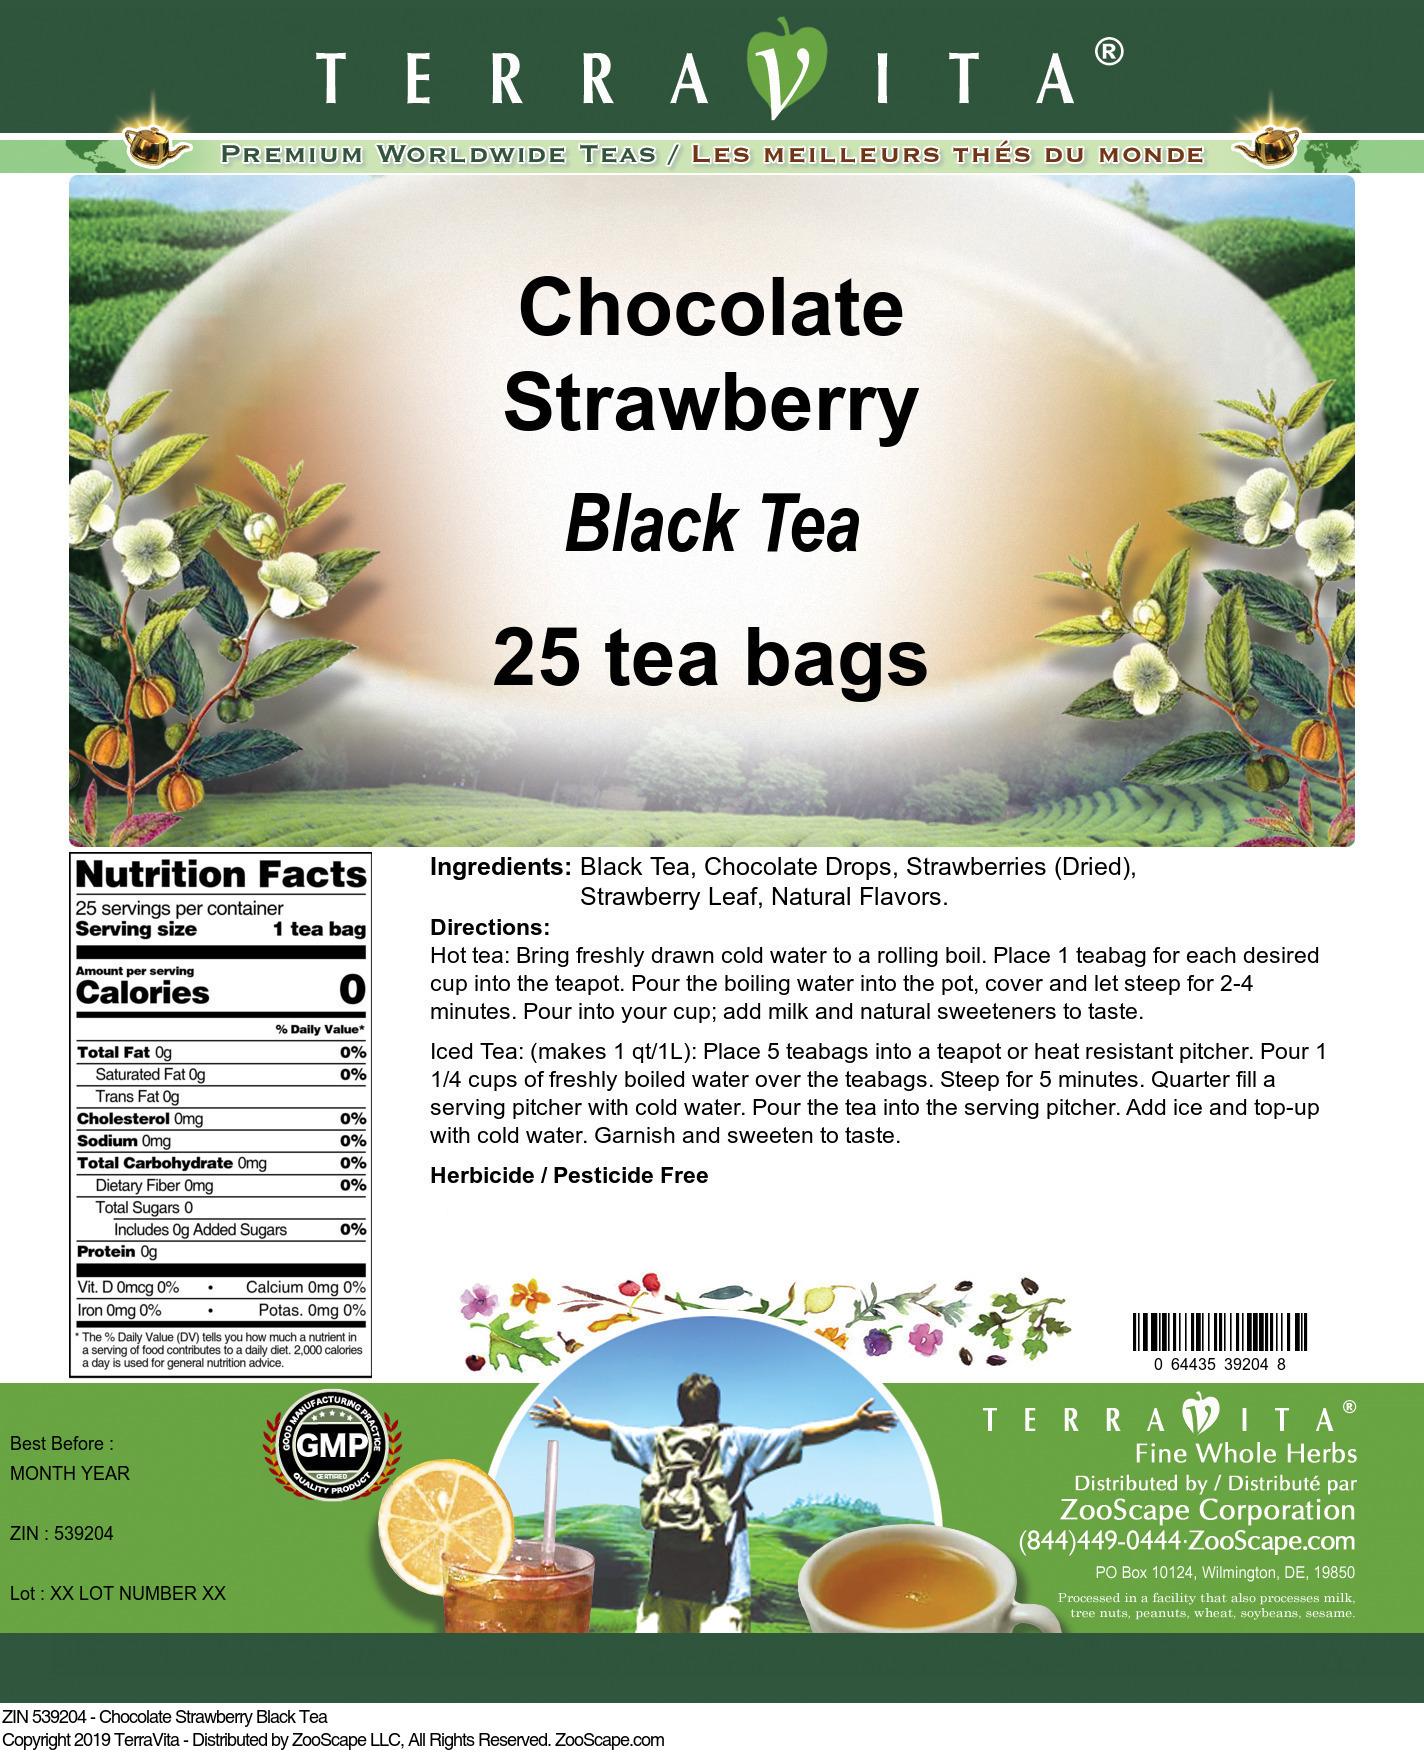 Chocolate Strawberry Black Tea